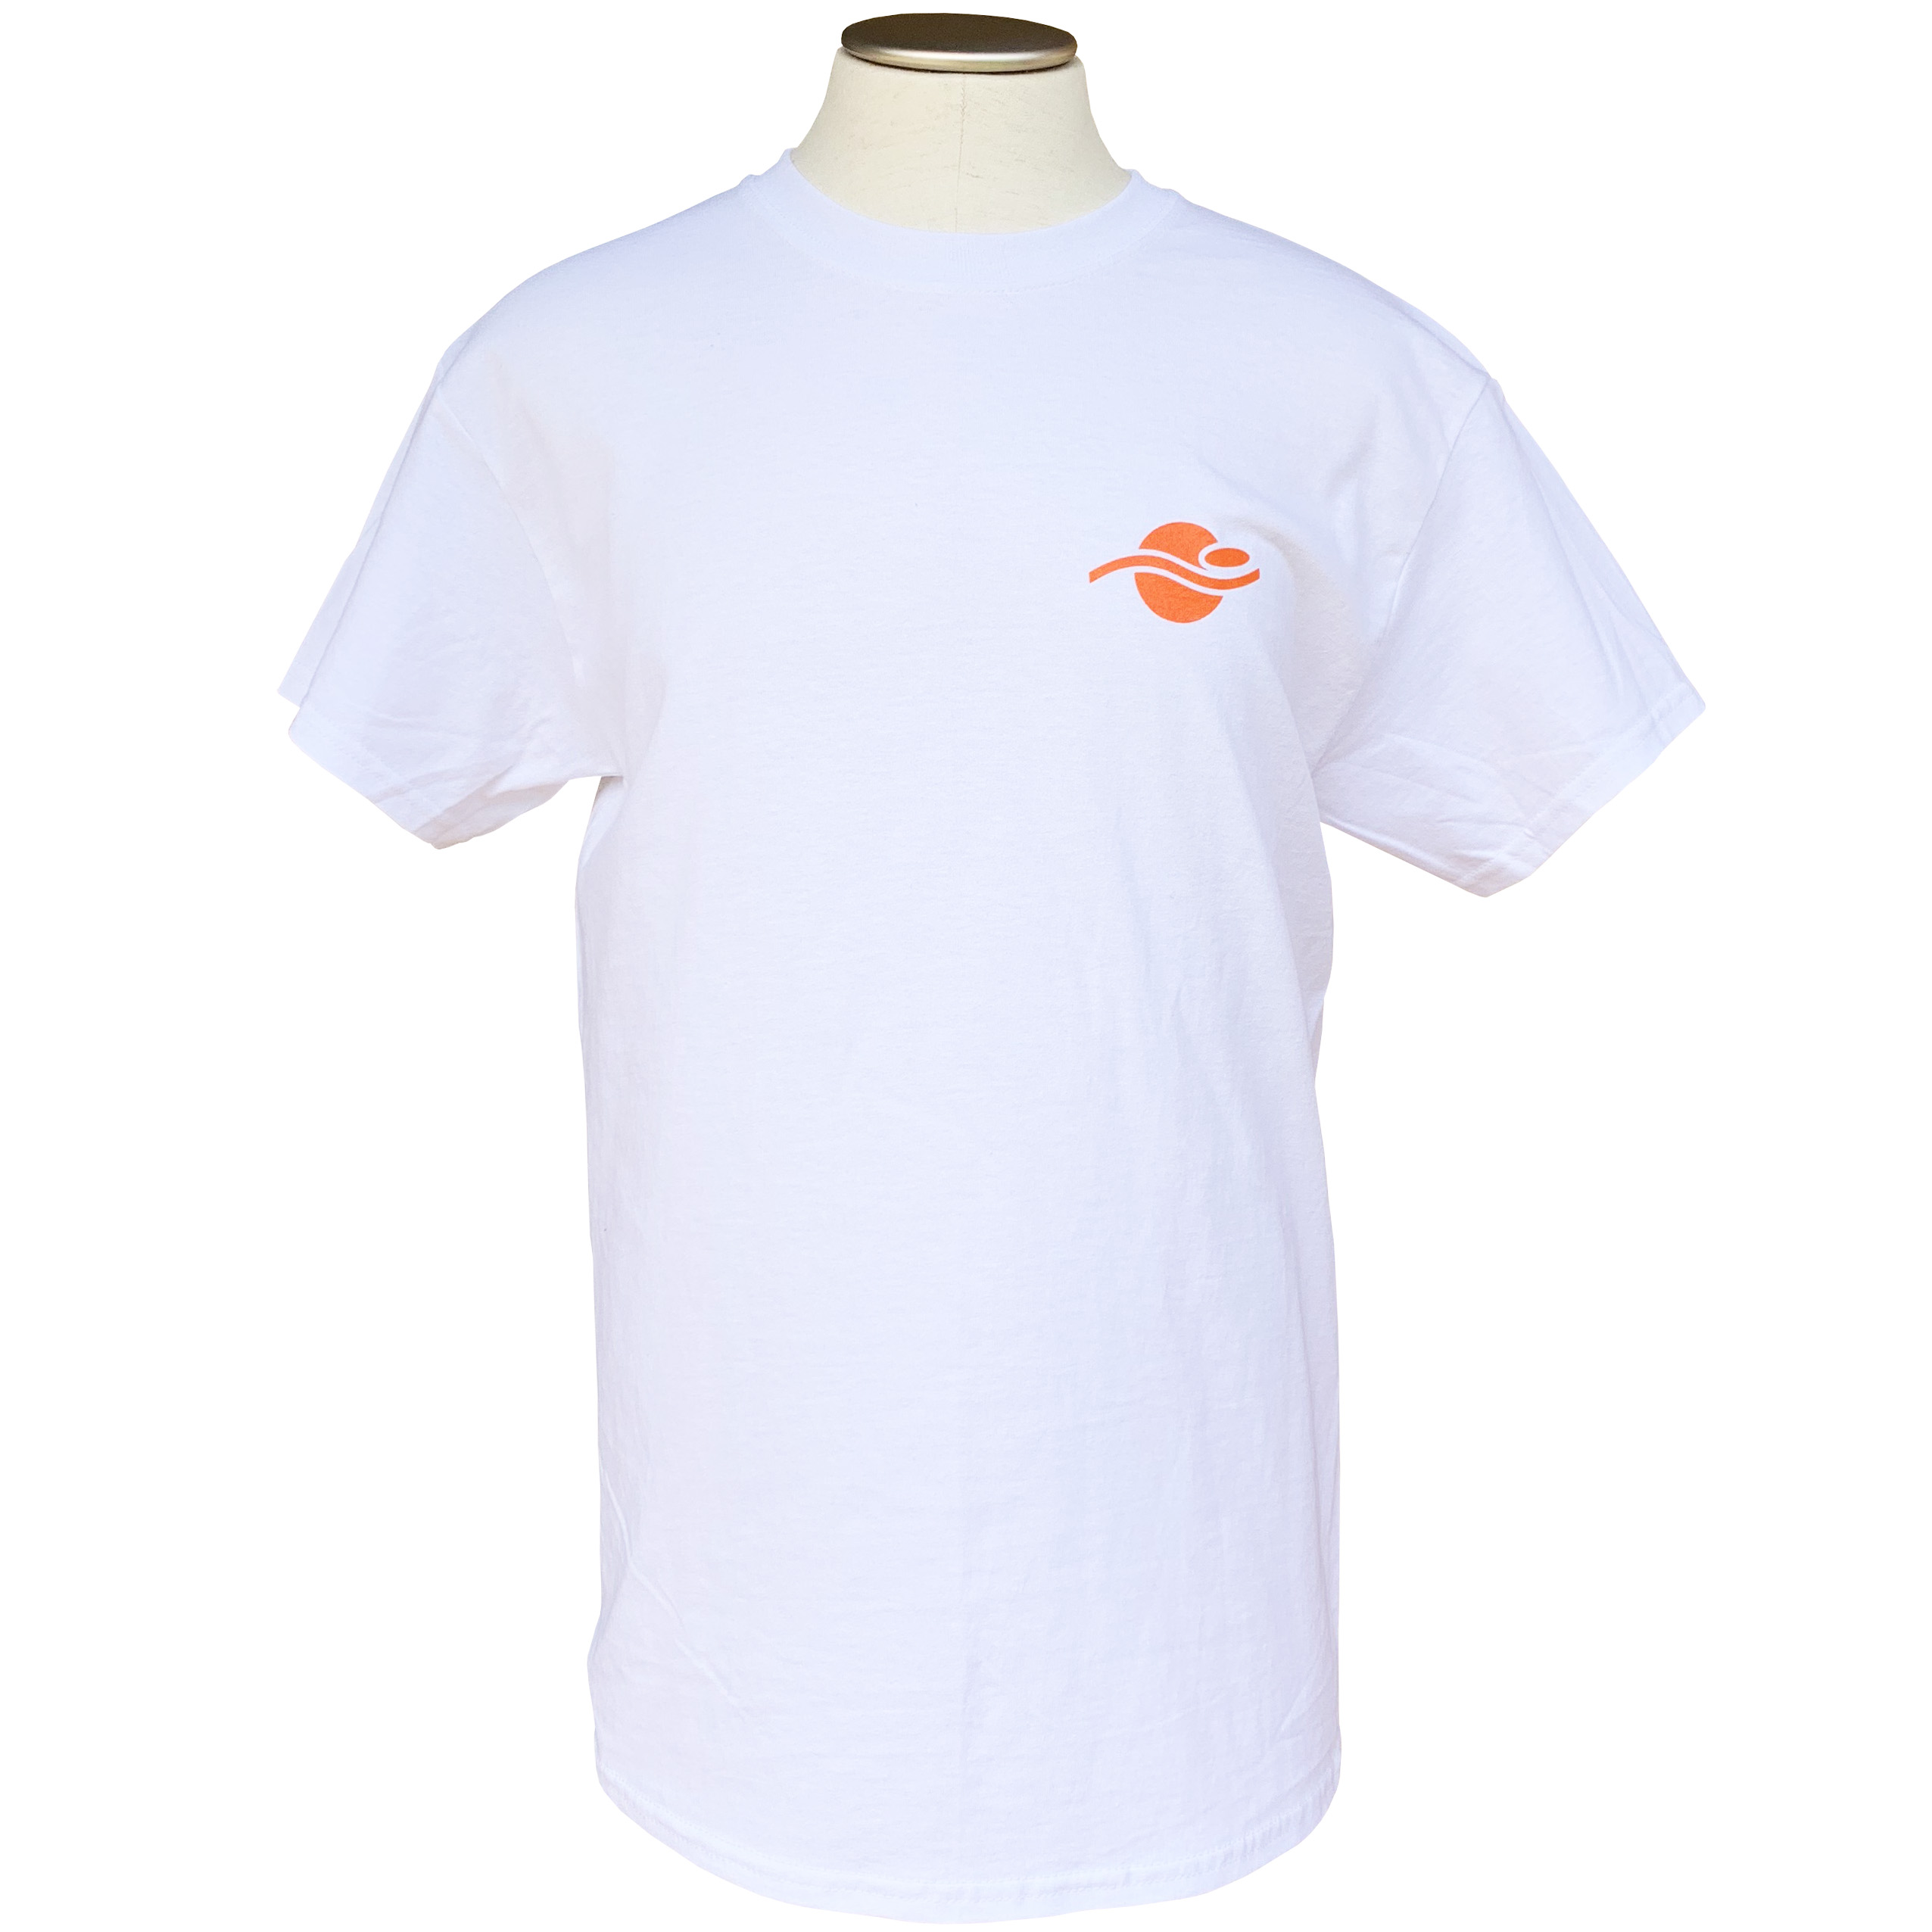 DS ロゴ Tシャツ